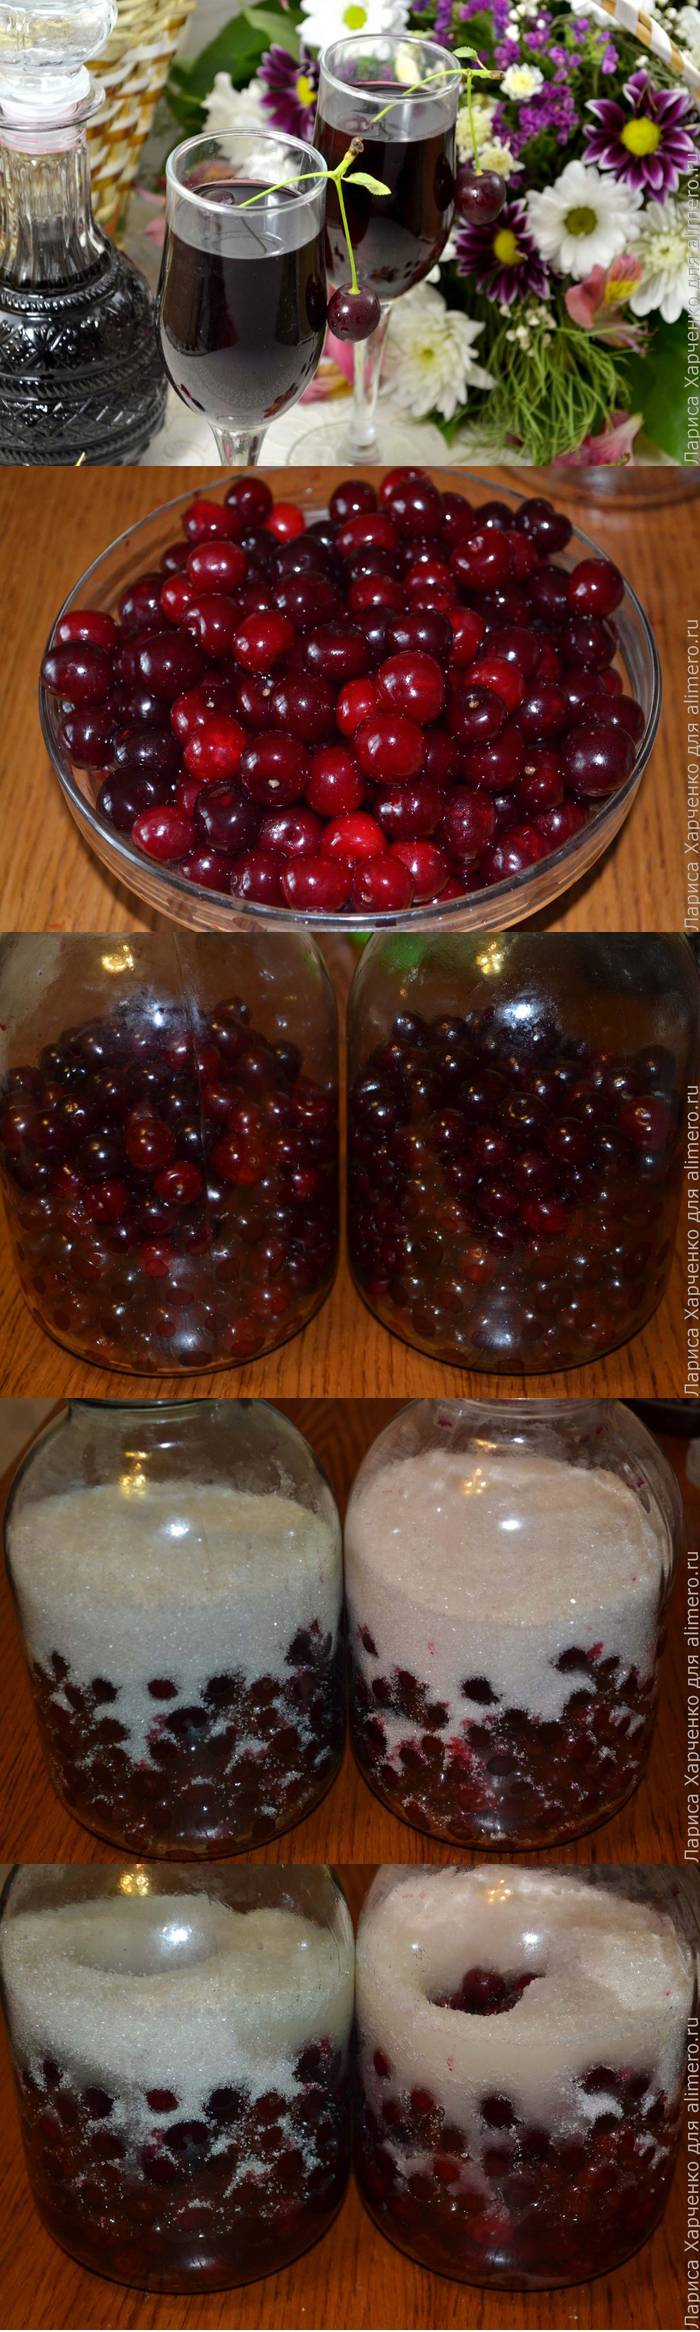 Настойка на вишне в домашних условиях рецепт 76